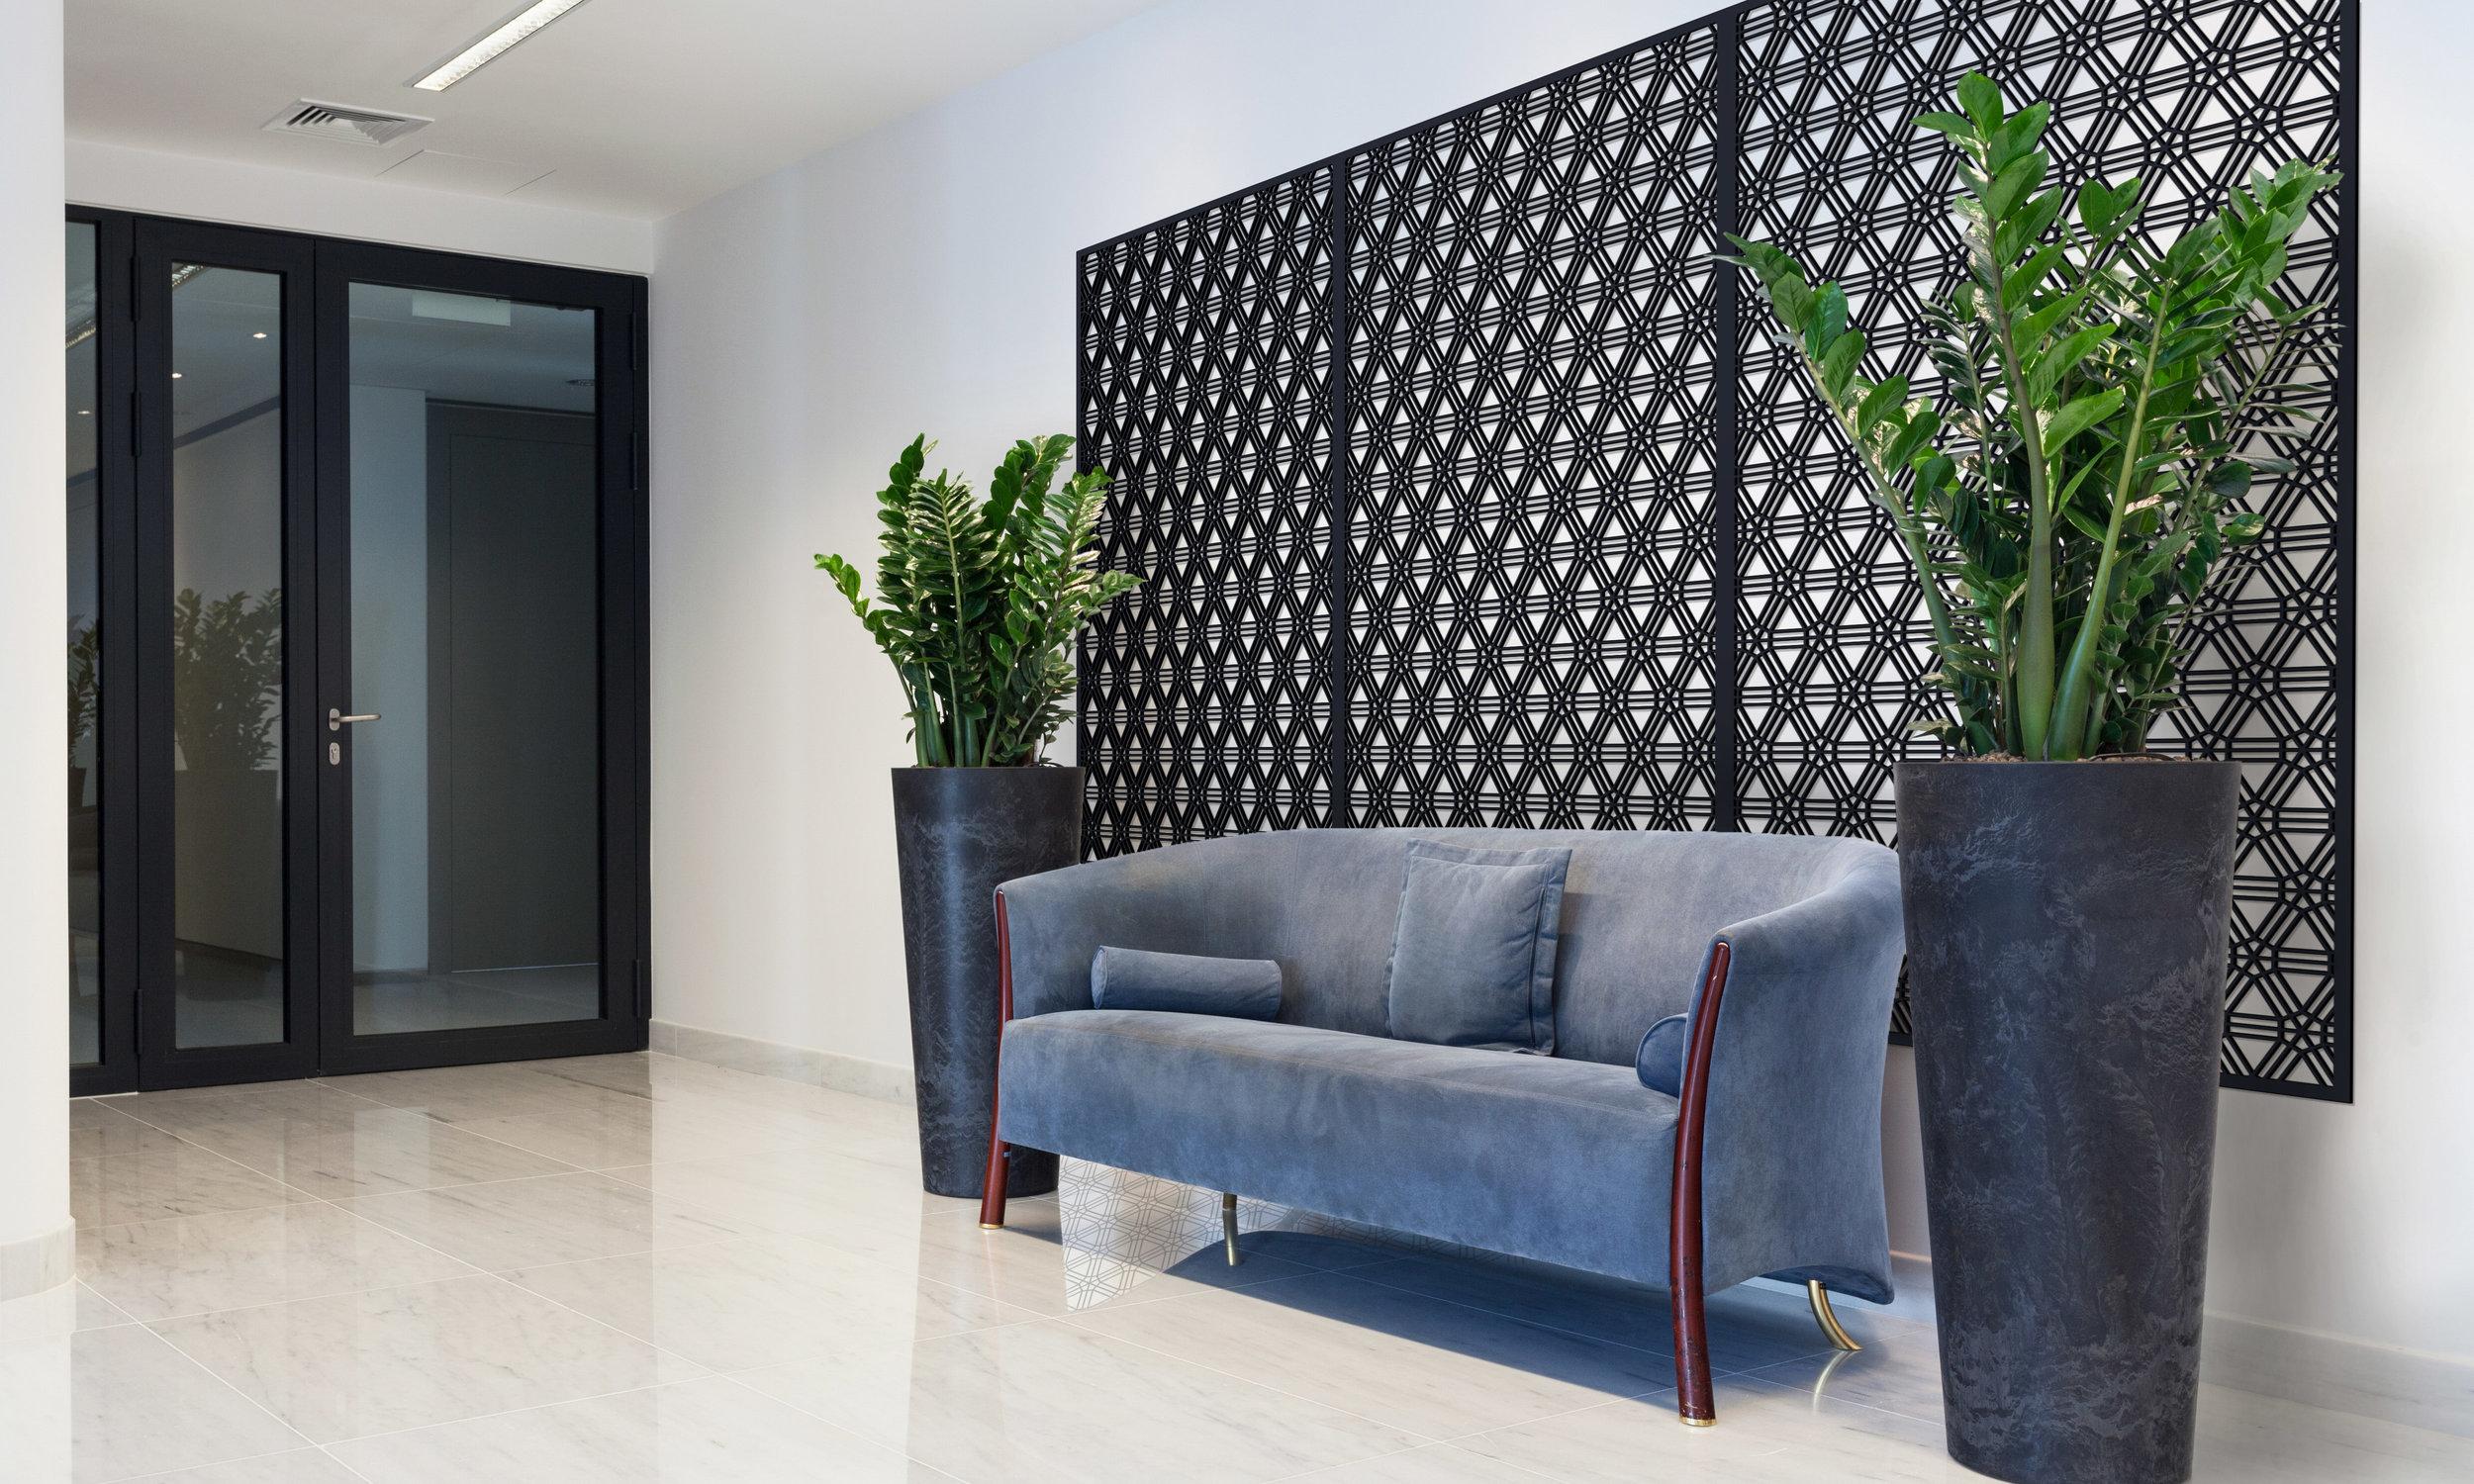 Installation Rendering B   Interlocking Wheels decorative office wall panel - painted